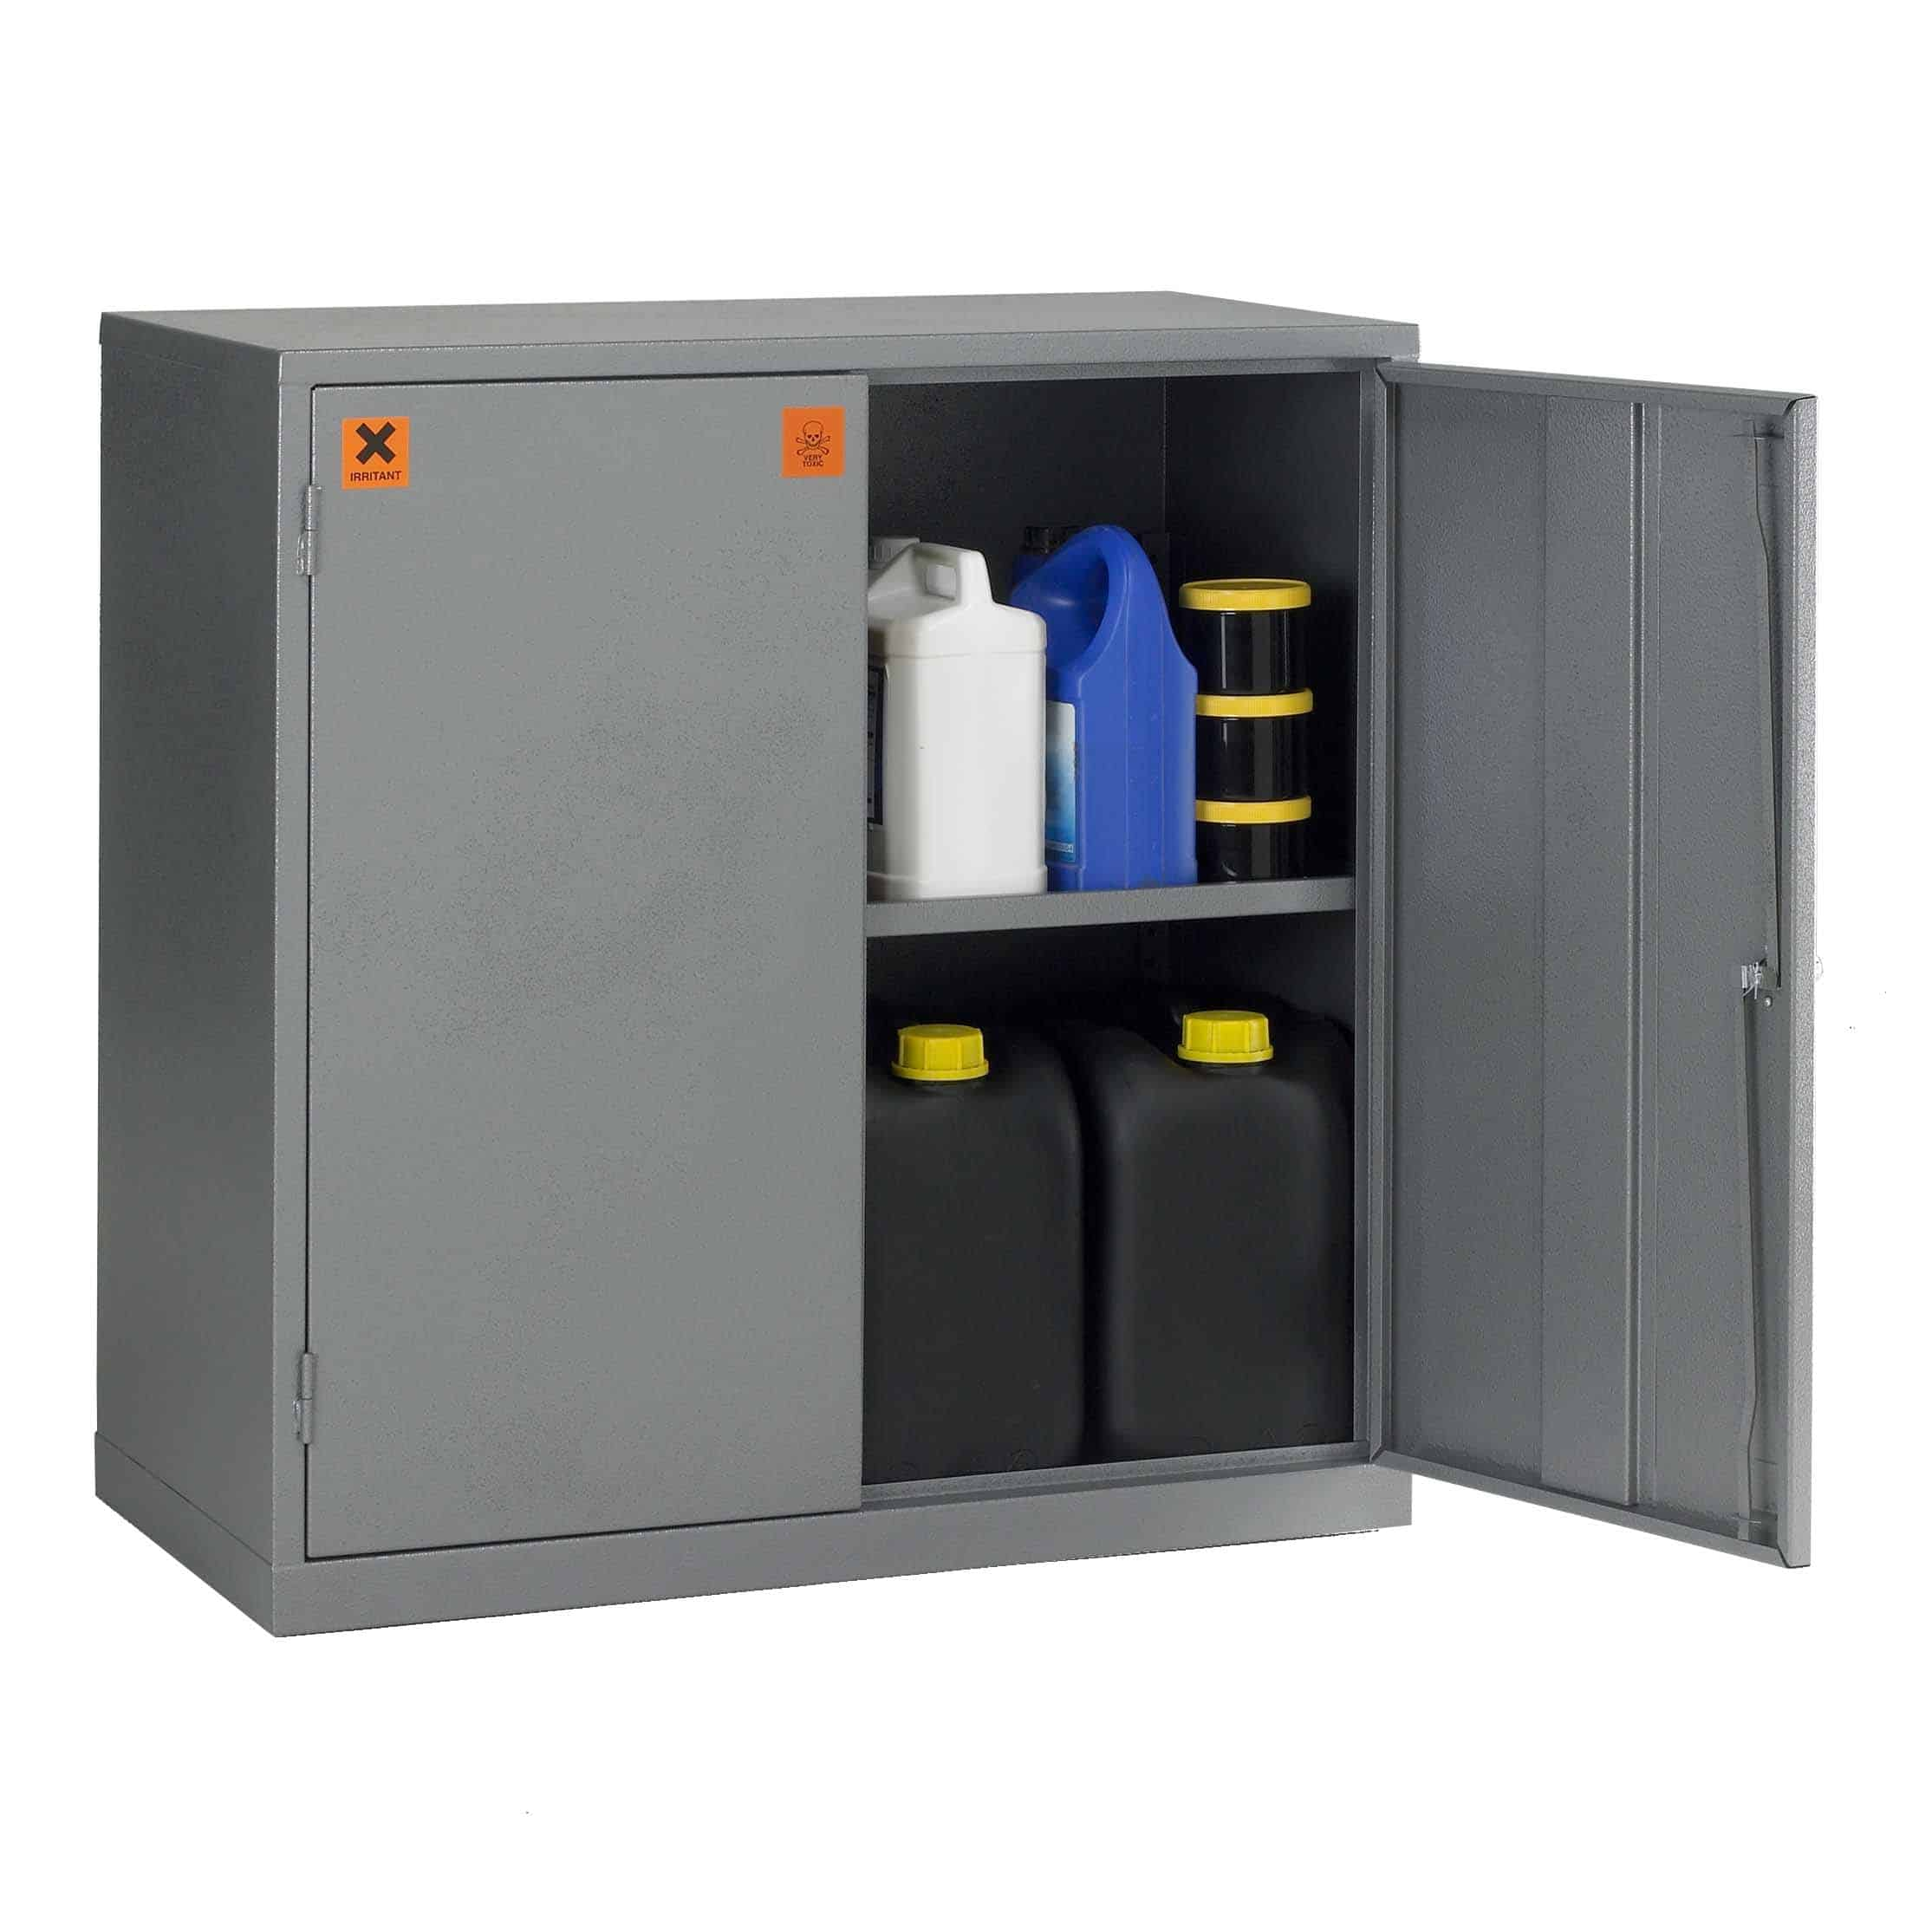 SU05C COSHH Storage Cabinets